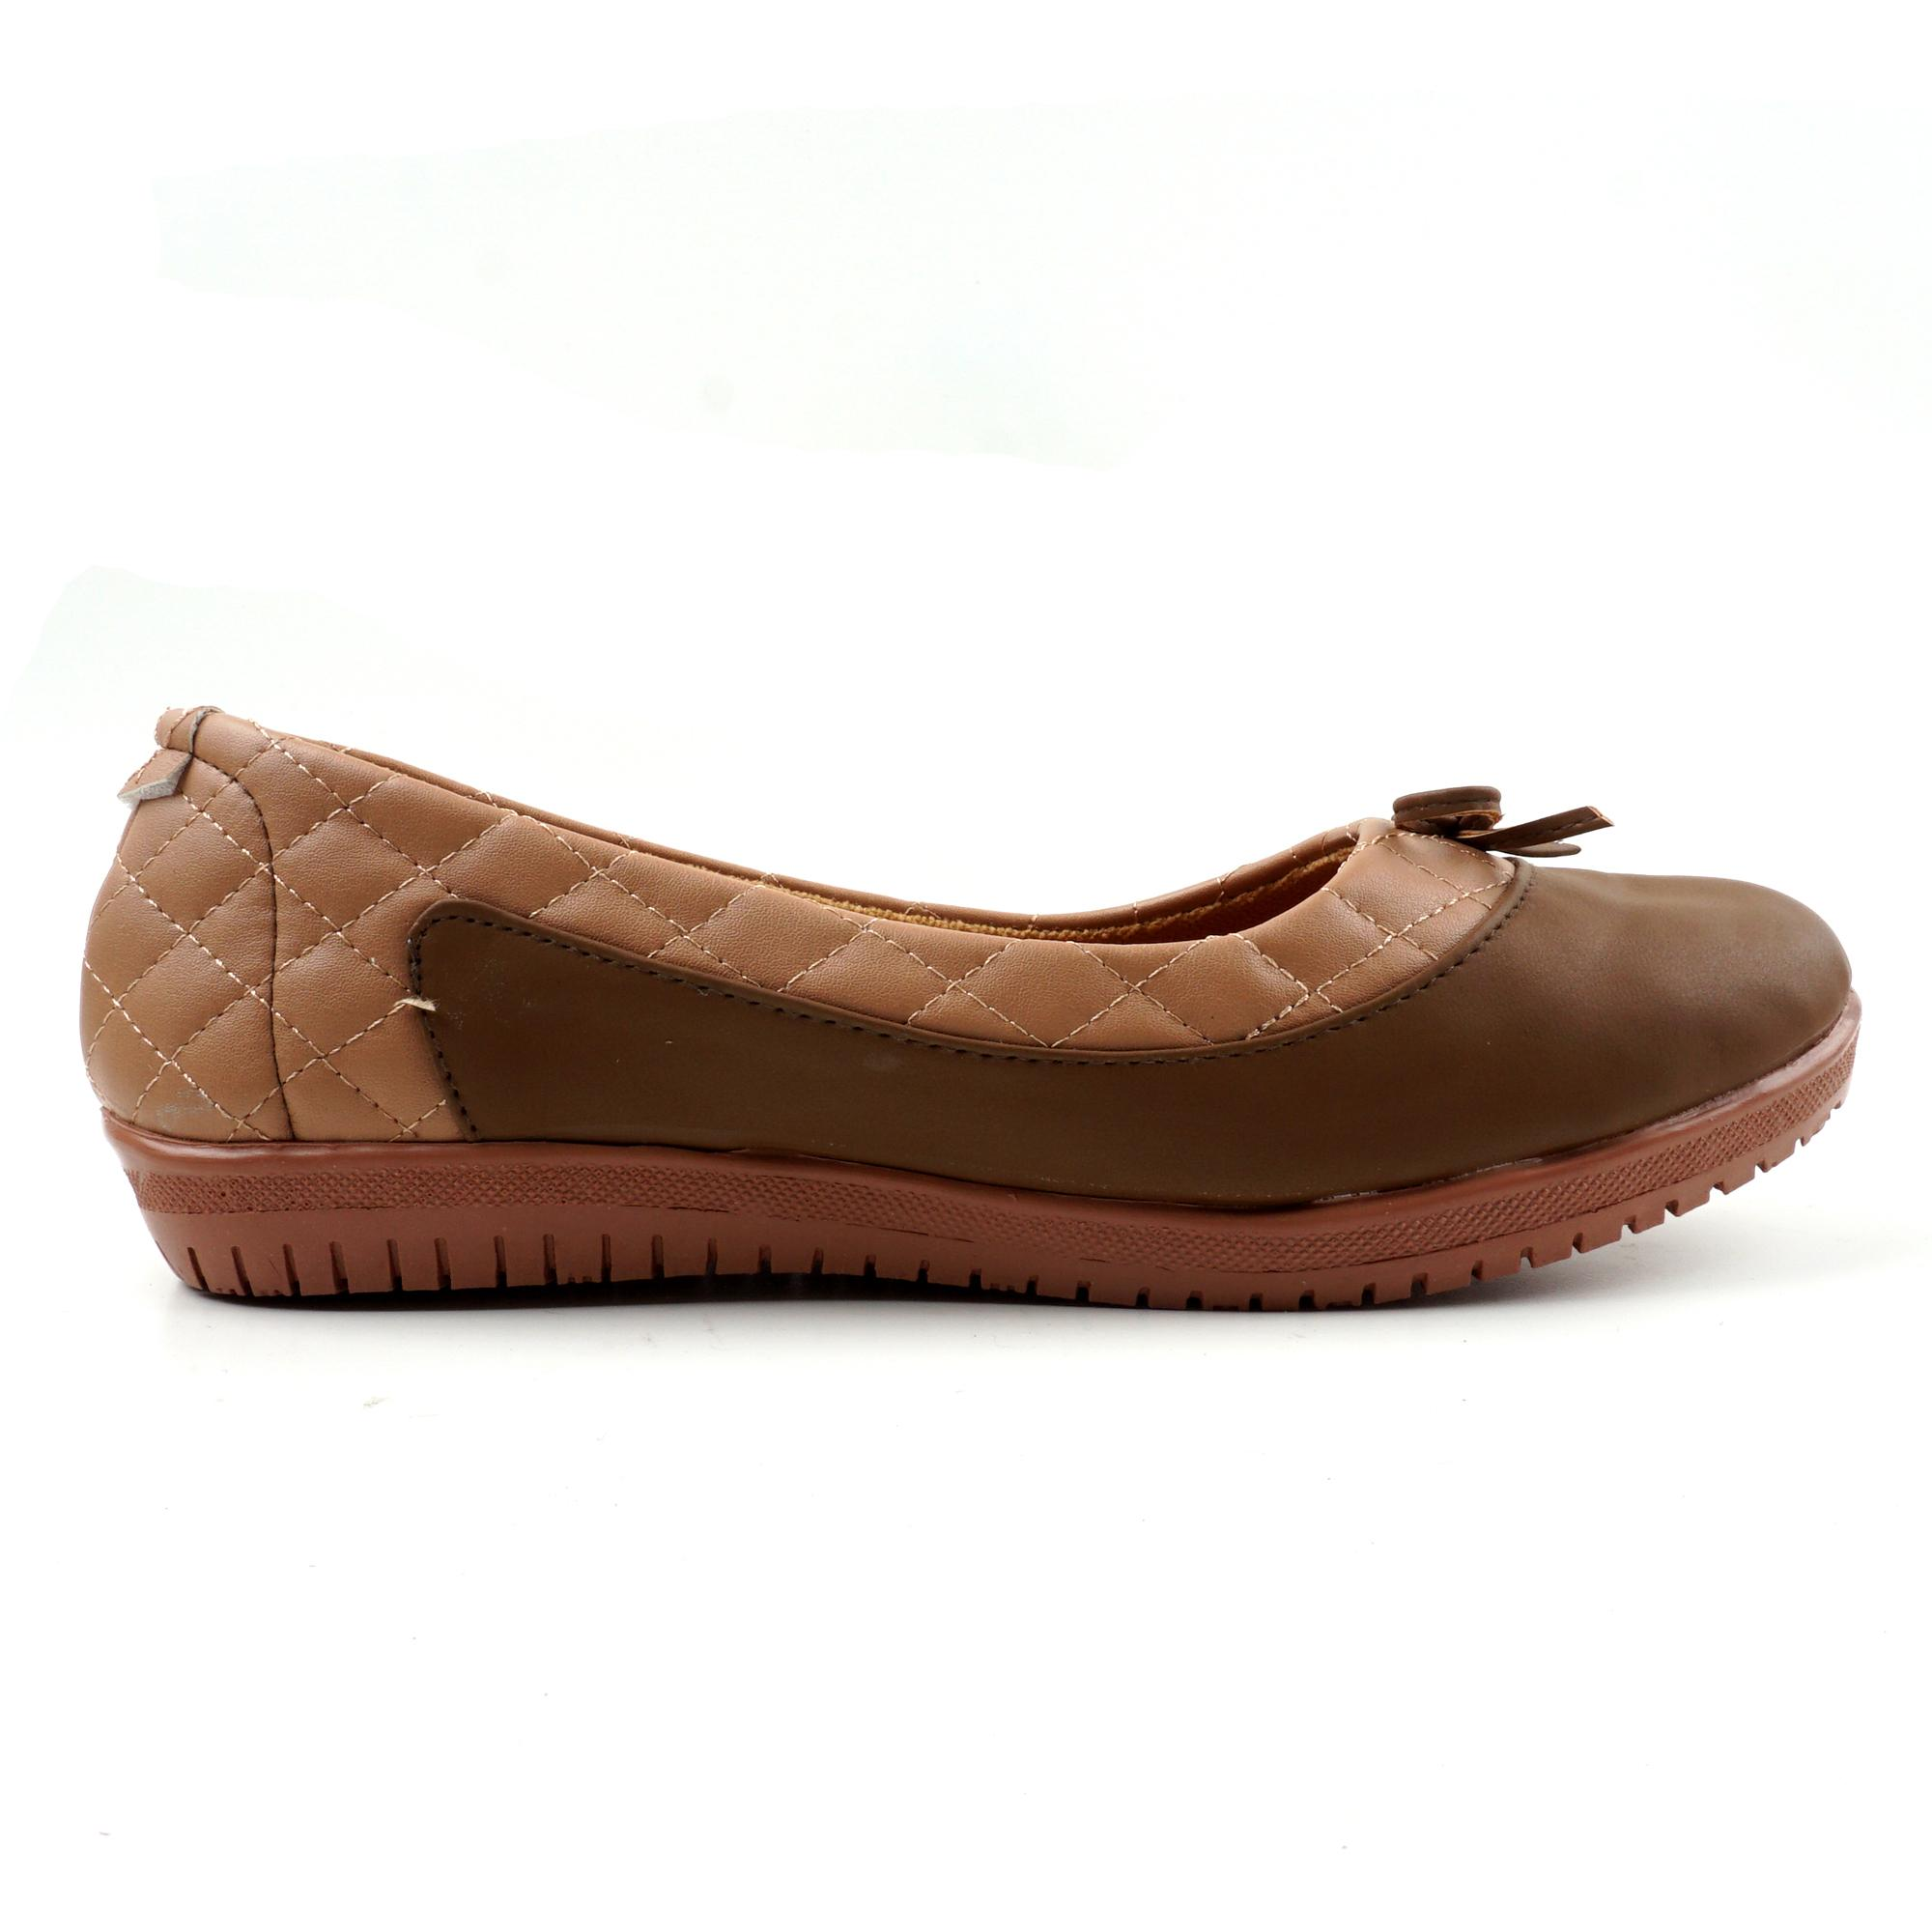 Detail Gambar Pluvia - Sepatu Flat Shoes Slip On Wanita Quilted BL08 - Coklat Moka / Hitam Terbaru